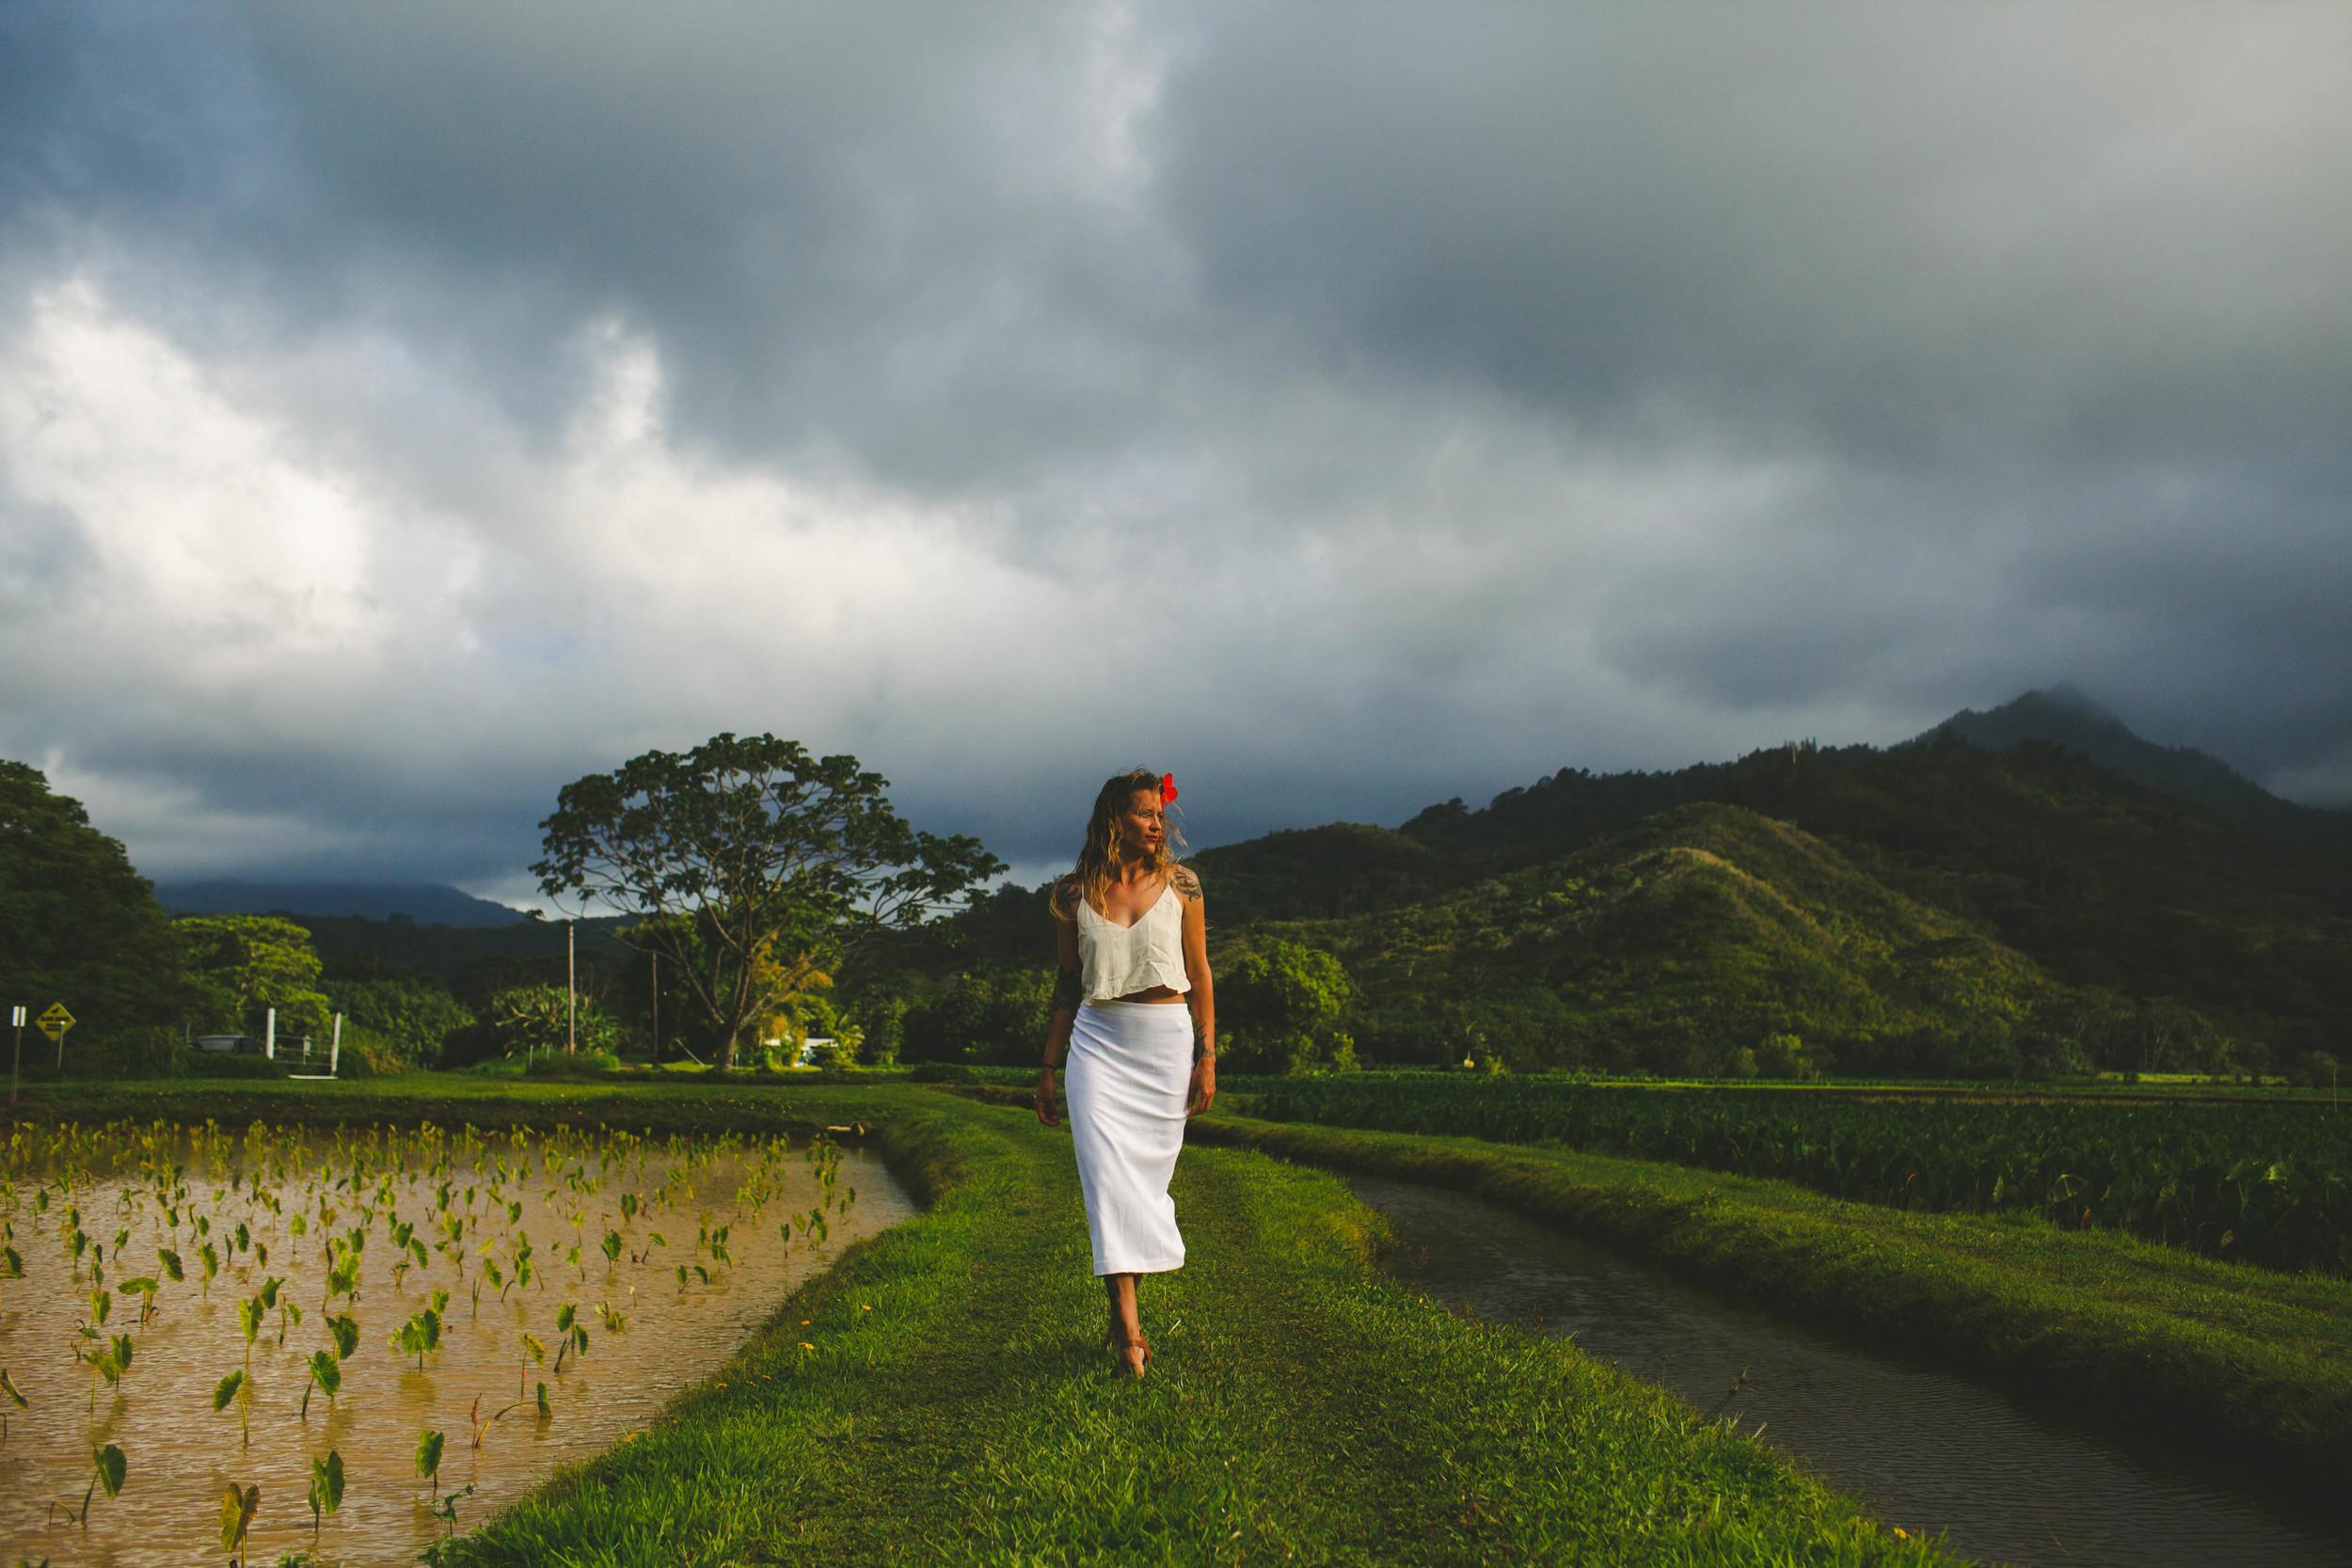 OSR_Kauai-52.jpg